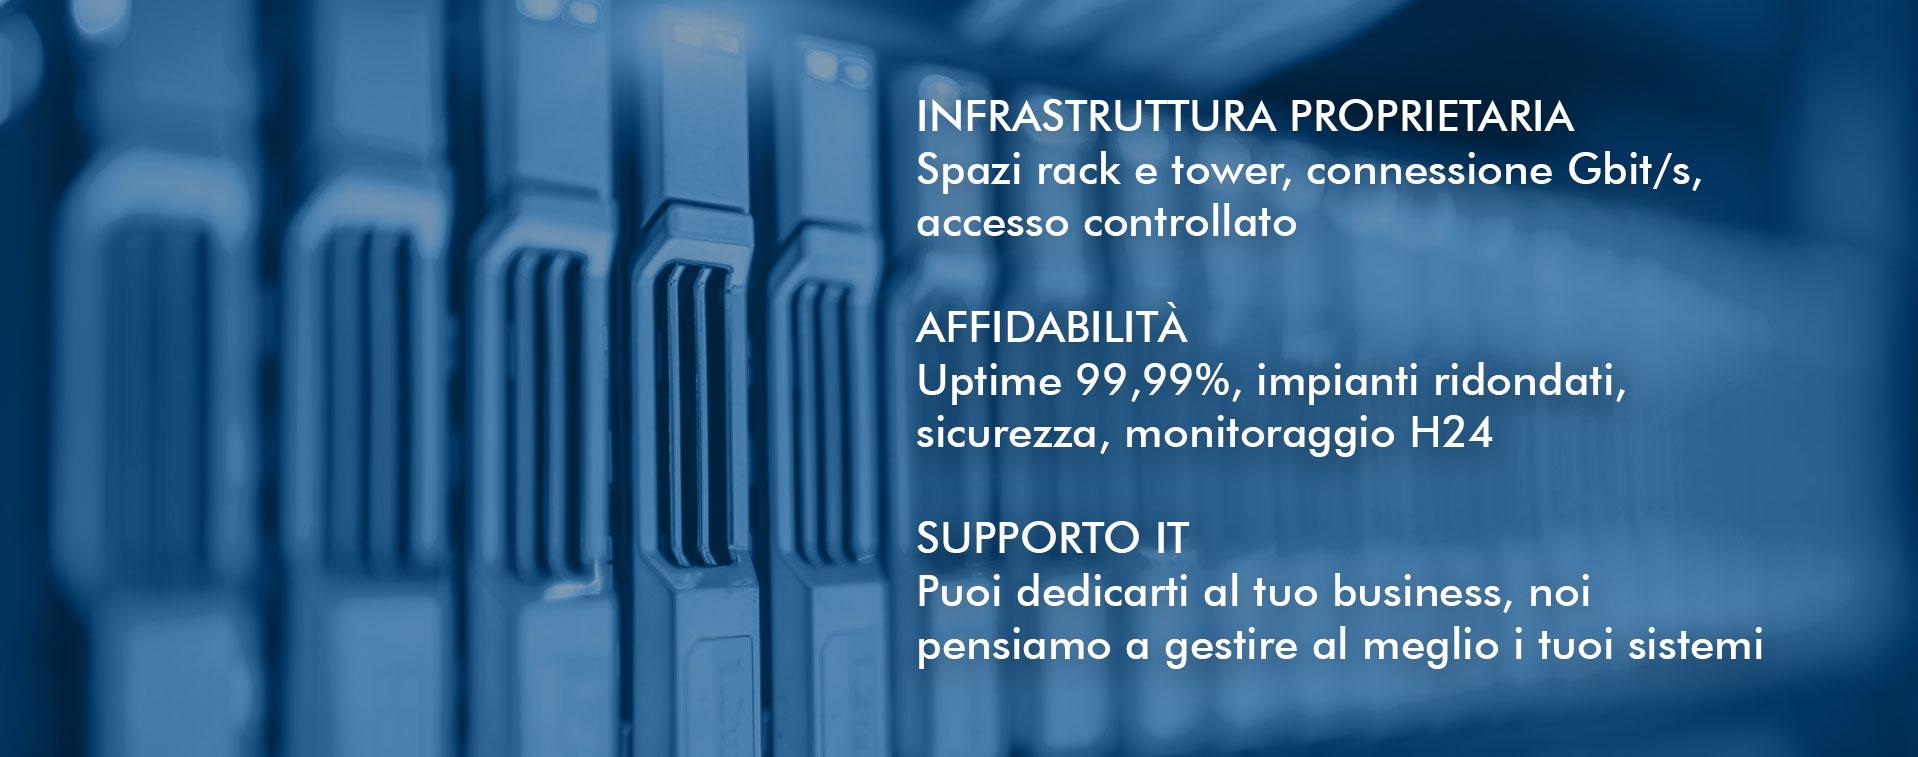 Media On Cloud - L'internet Data Center in Sicilia.